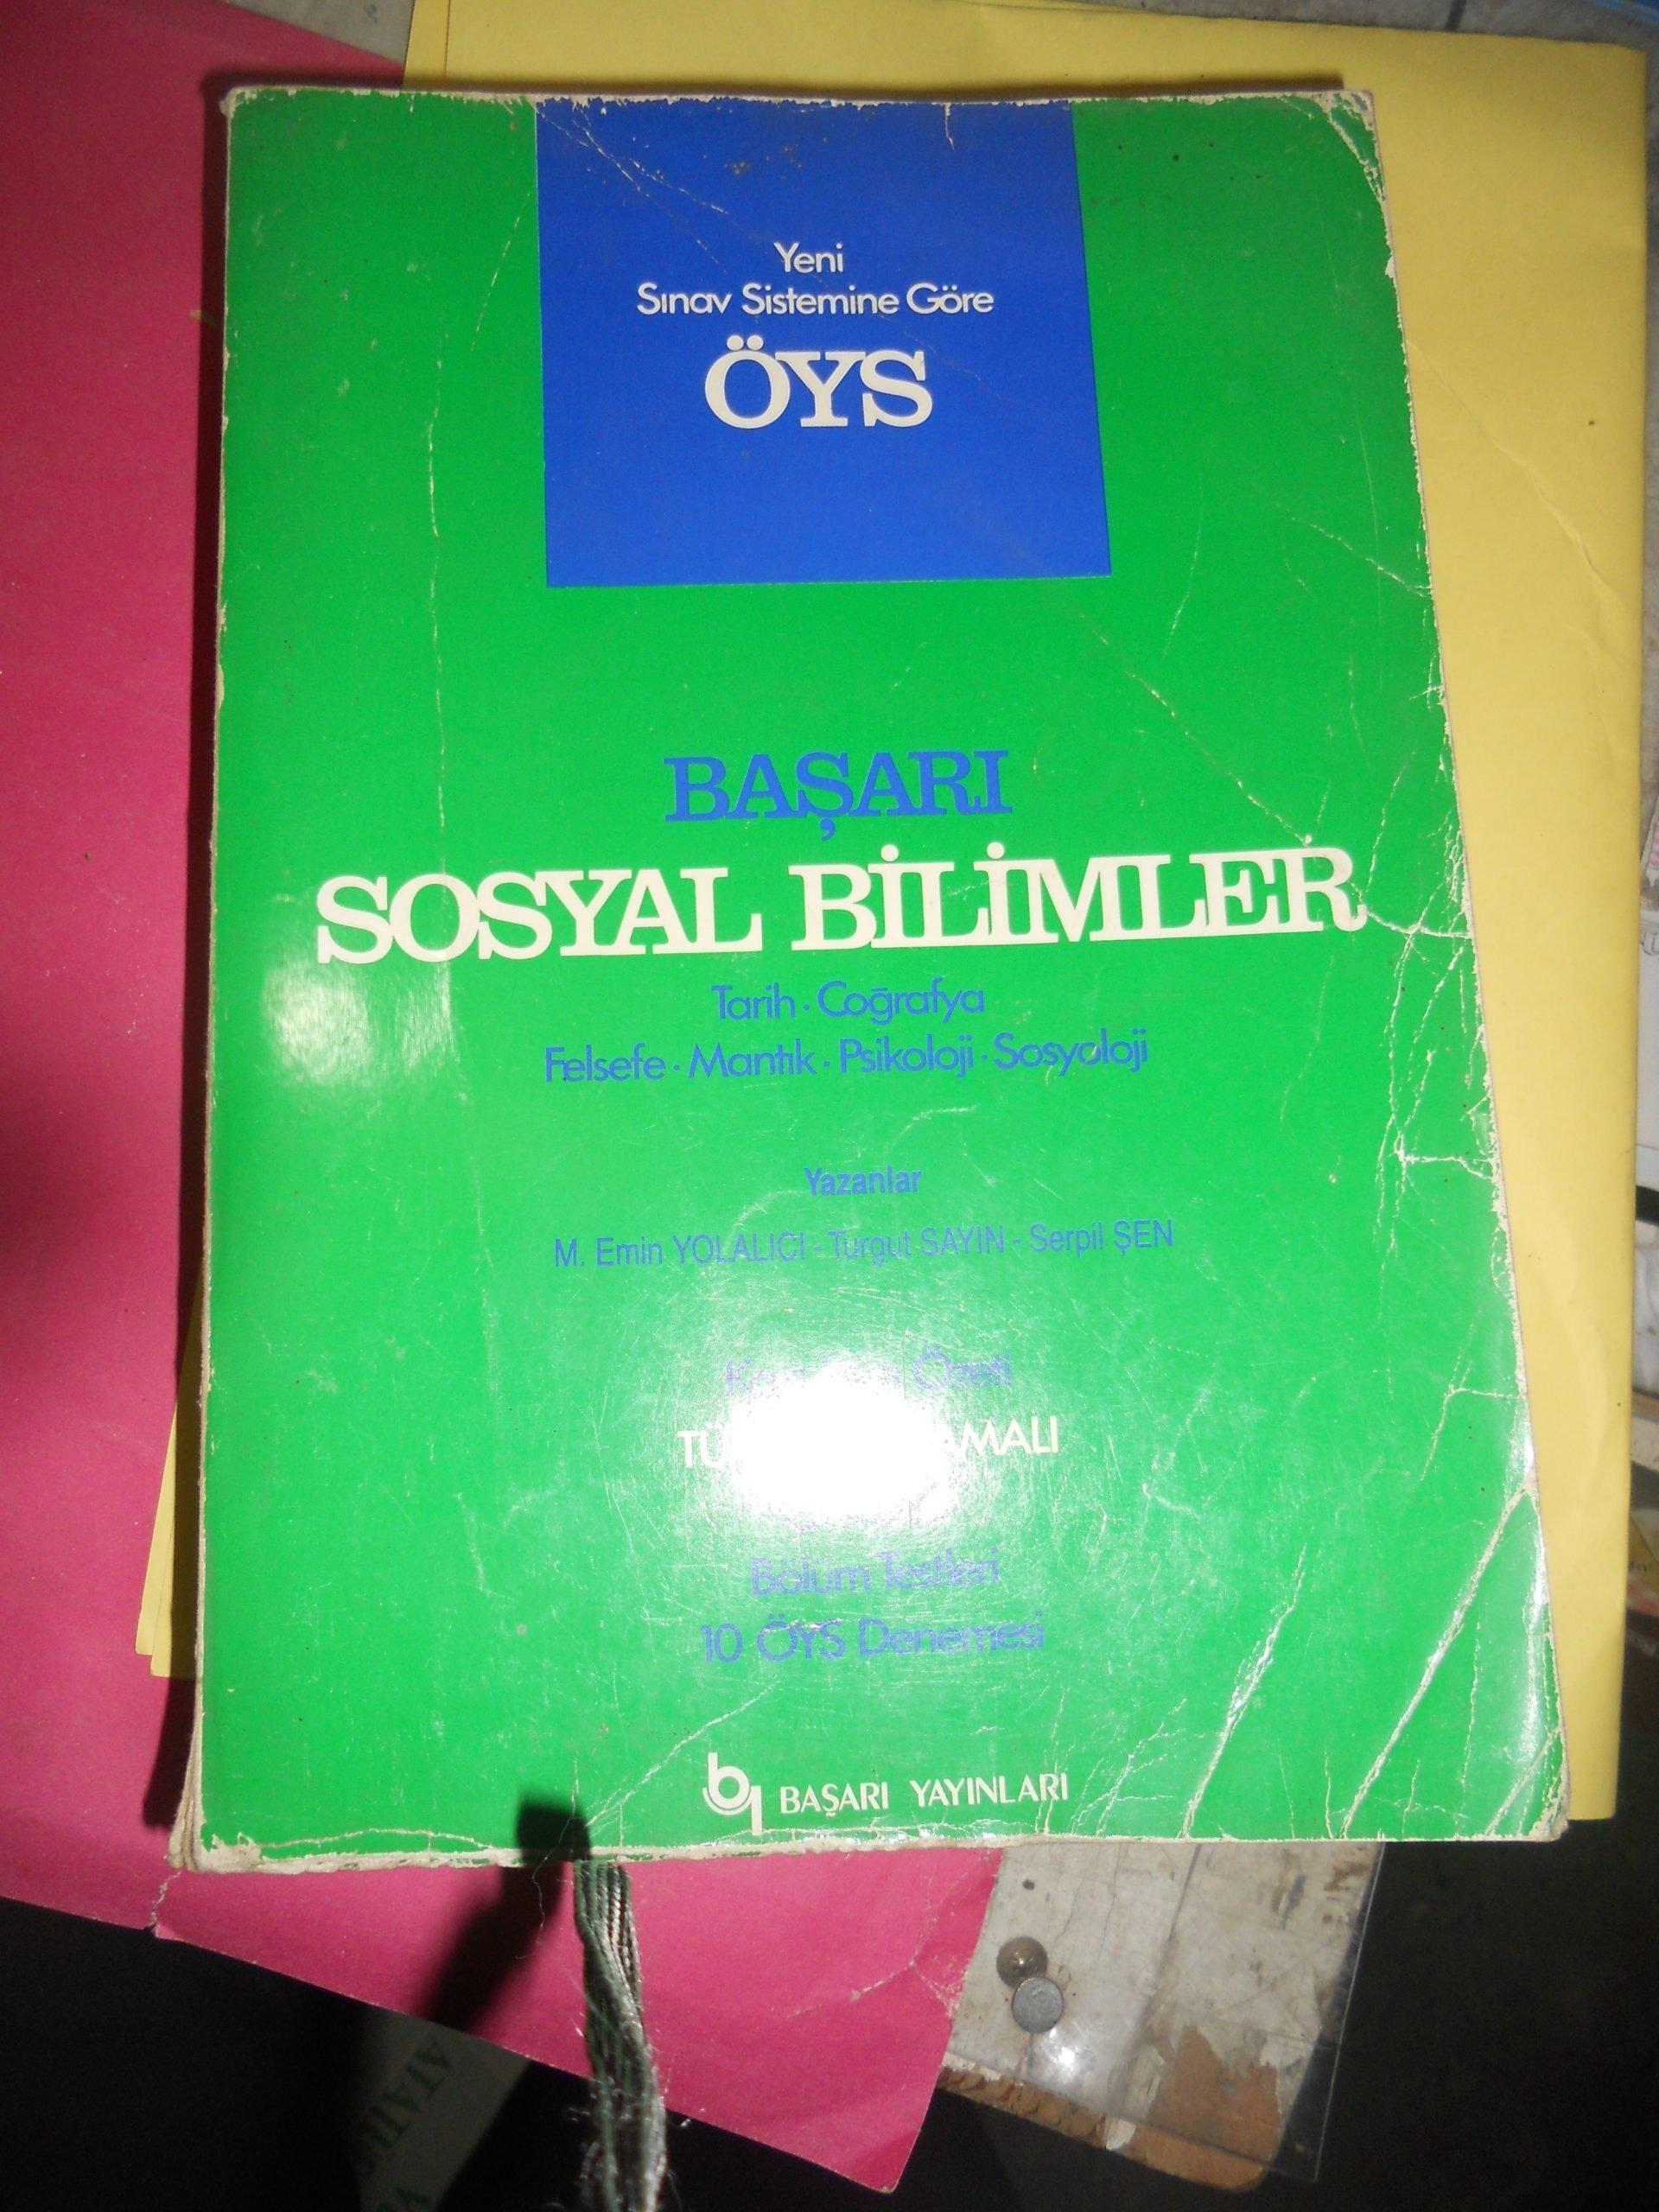 ÖYS BAŞARI SOSYAL BİLİMLER/BAŞARI YAY/ 15 TL